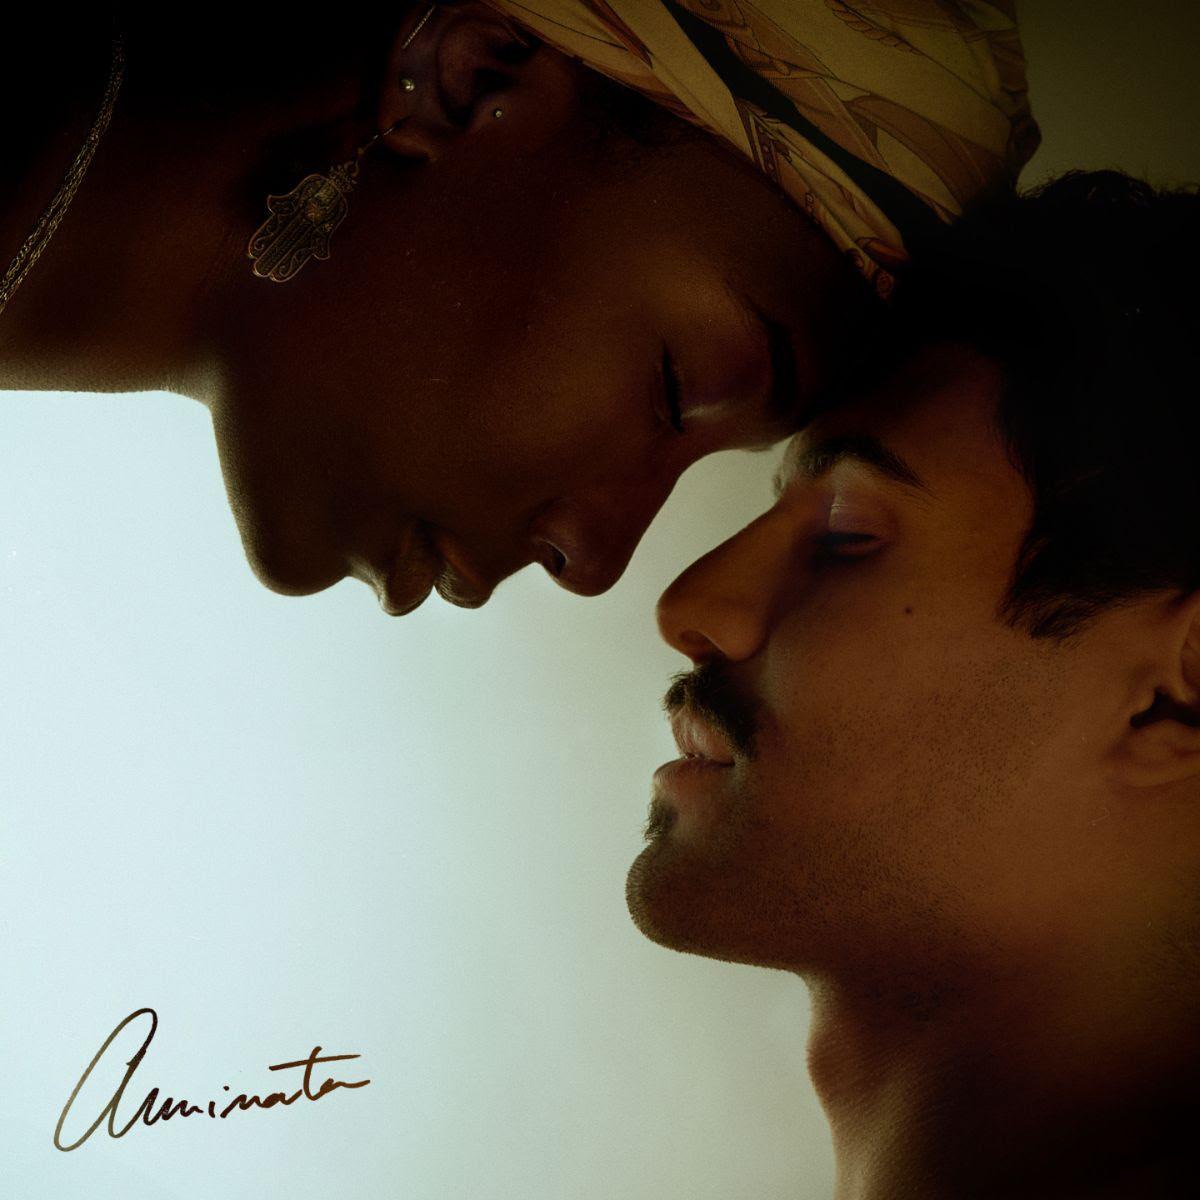 De.Ville: Aminata — beautiful meeting with an enchanting woman